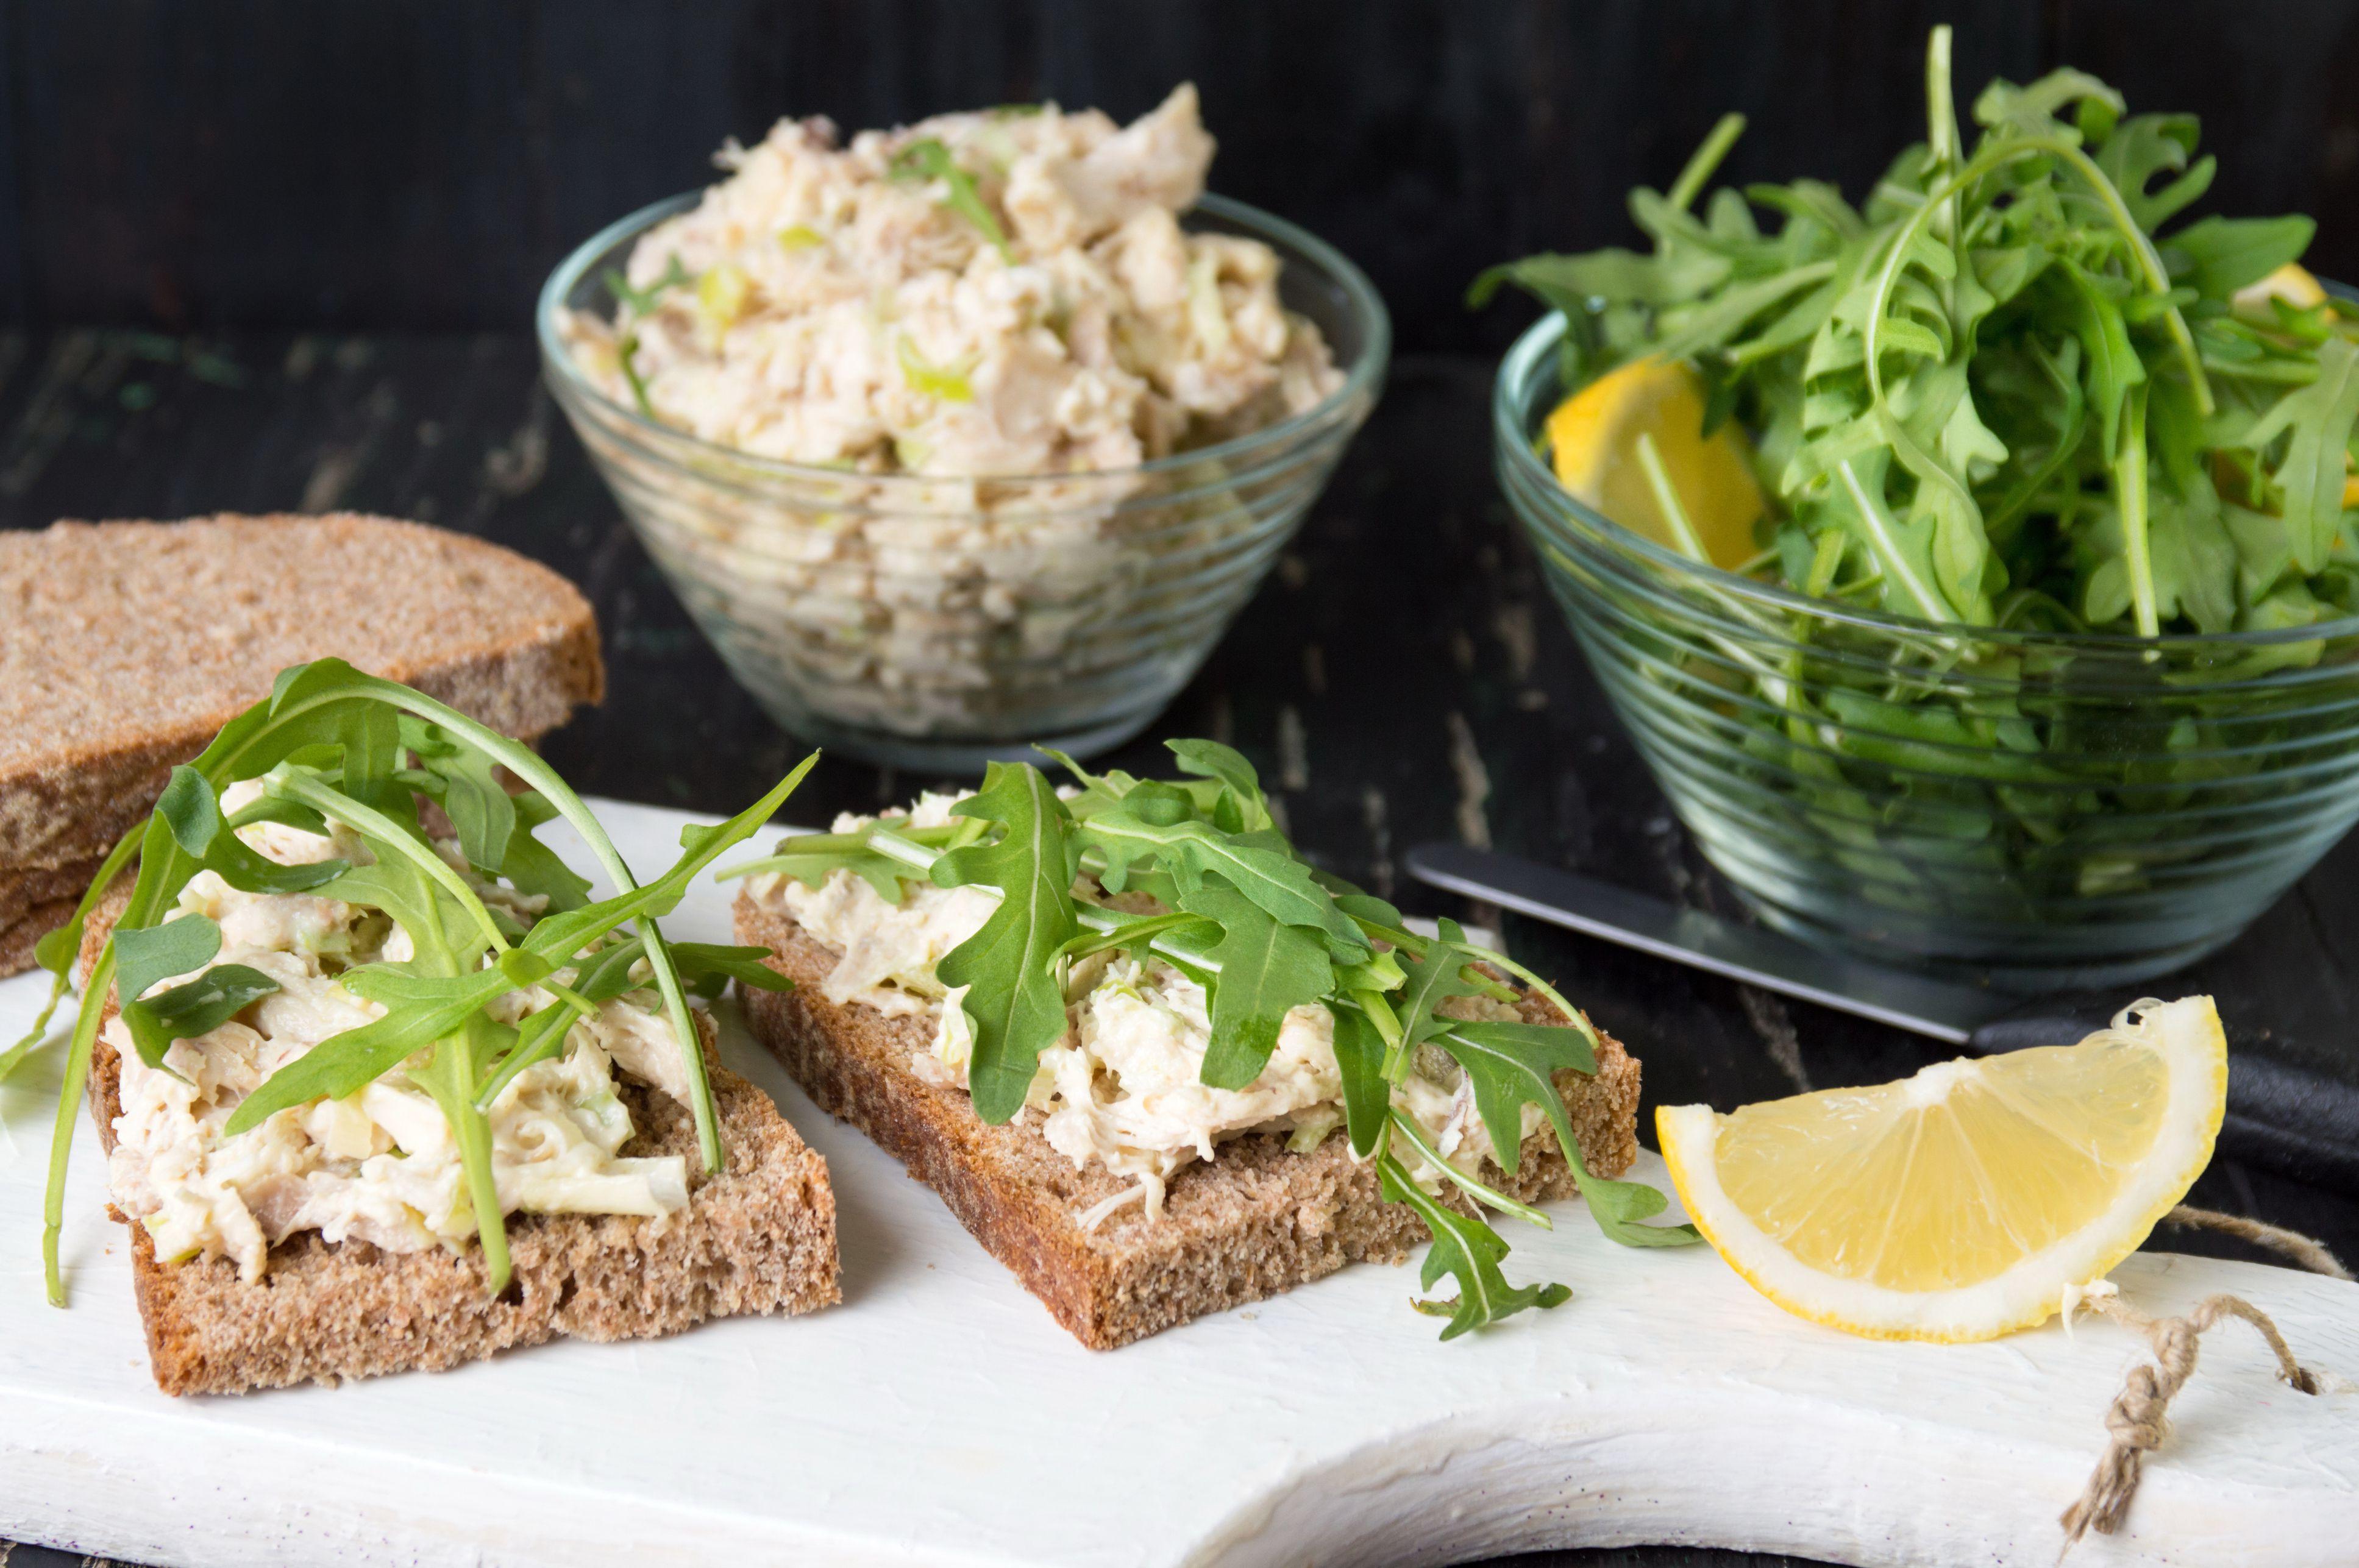 Chicken salad and arugula sandwiches